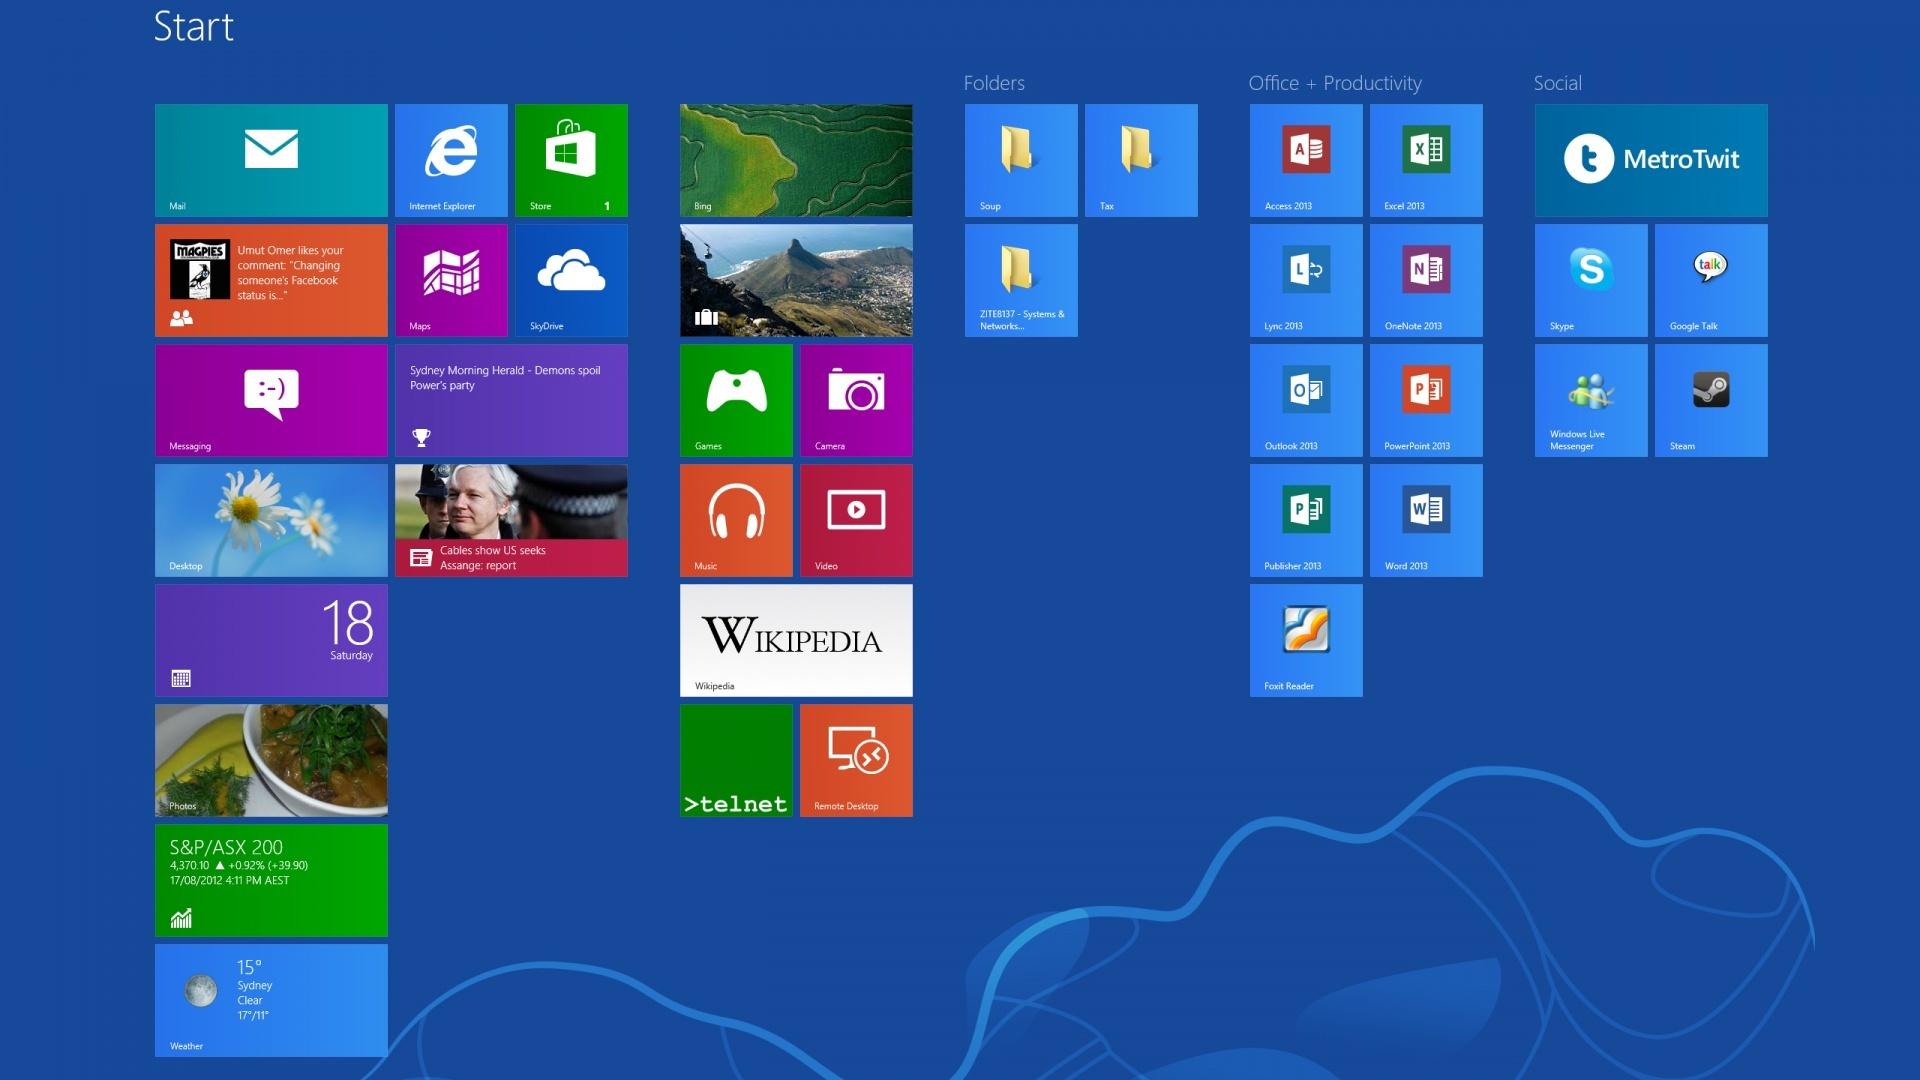 windows 8 start screen blue wallpaper HD Desktop Wallpapers Page2 1920x1080